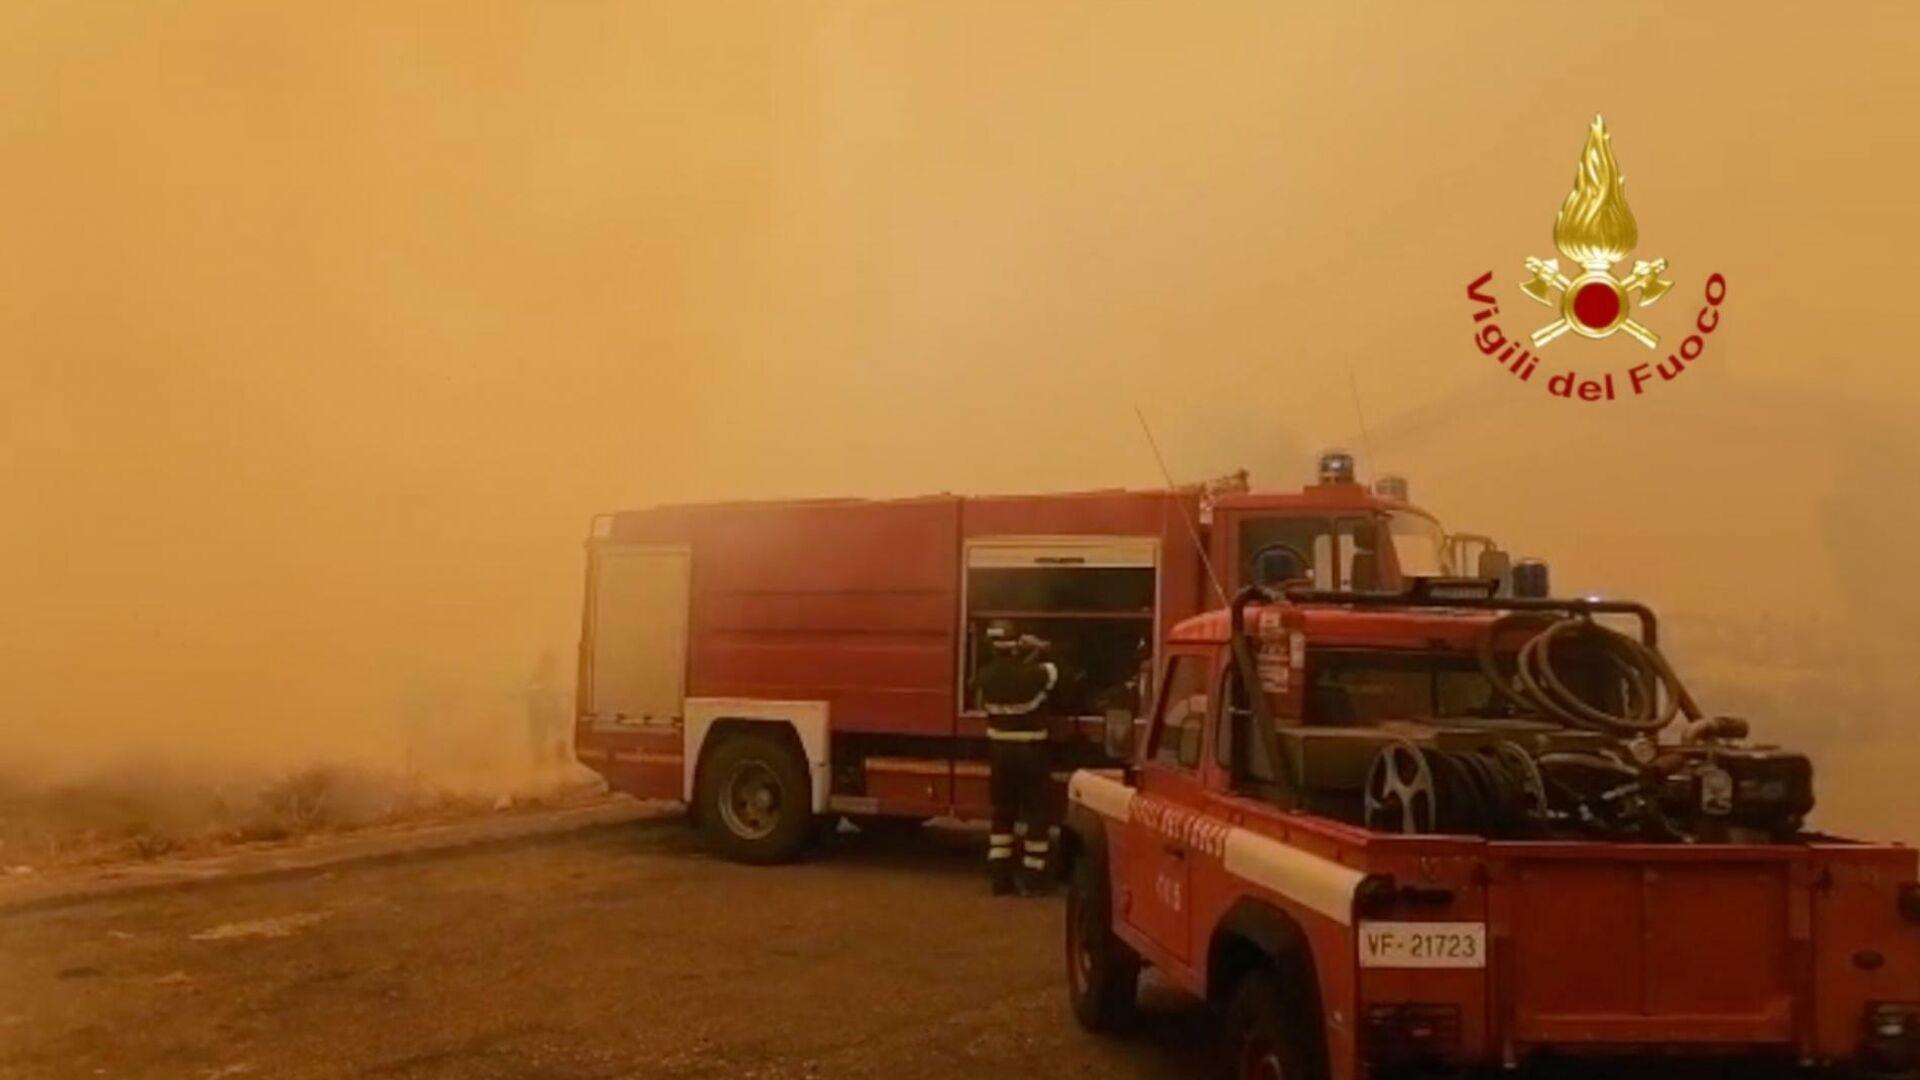 Emergenza incendi in Sardegna  - Sputnik Italia, 1920, 26.07.2021